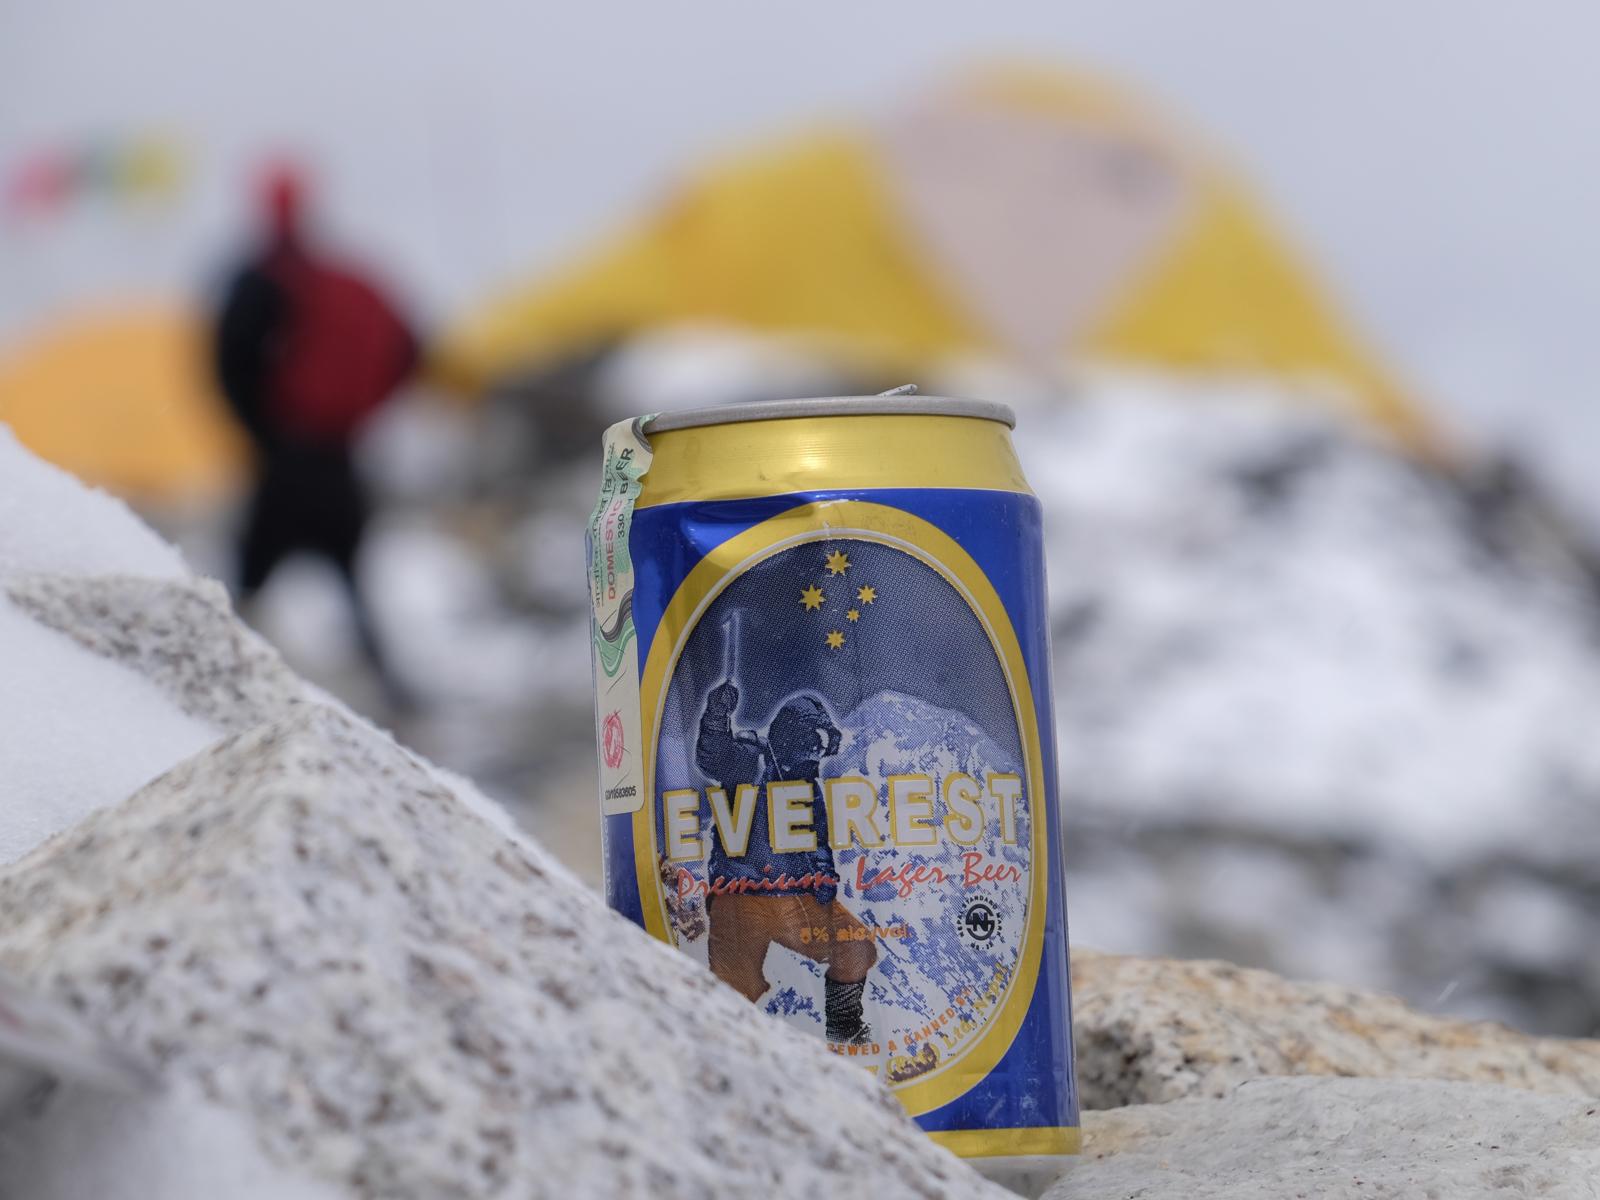 Everest Base Camp, Everest 3 pass #2 37